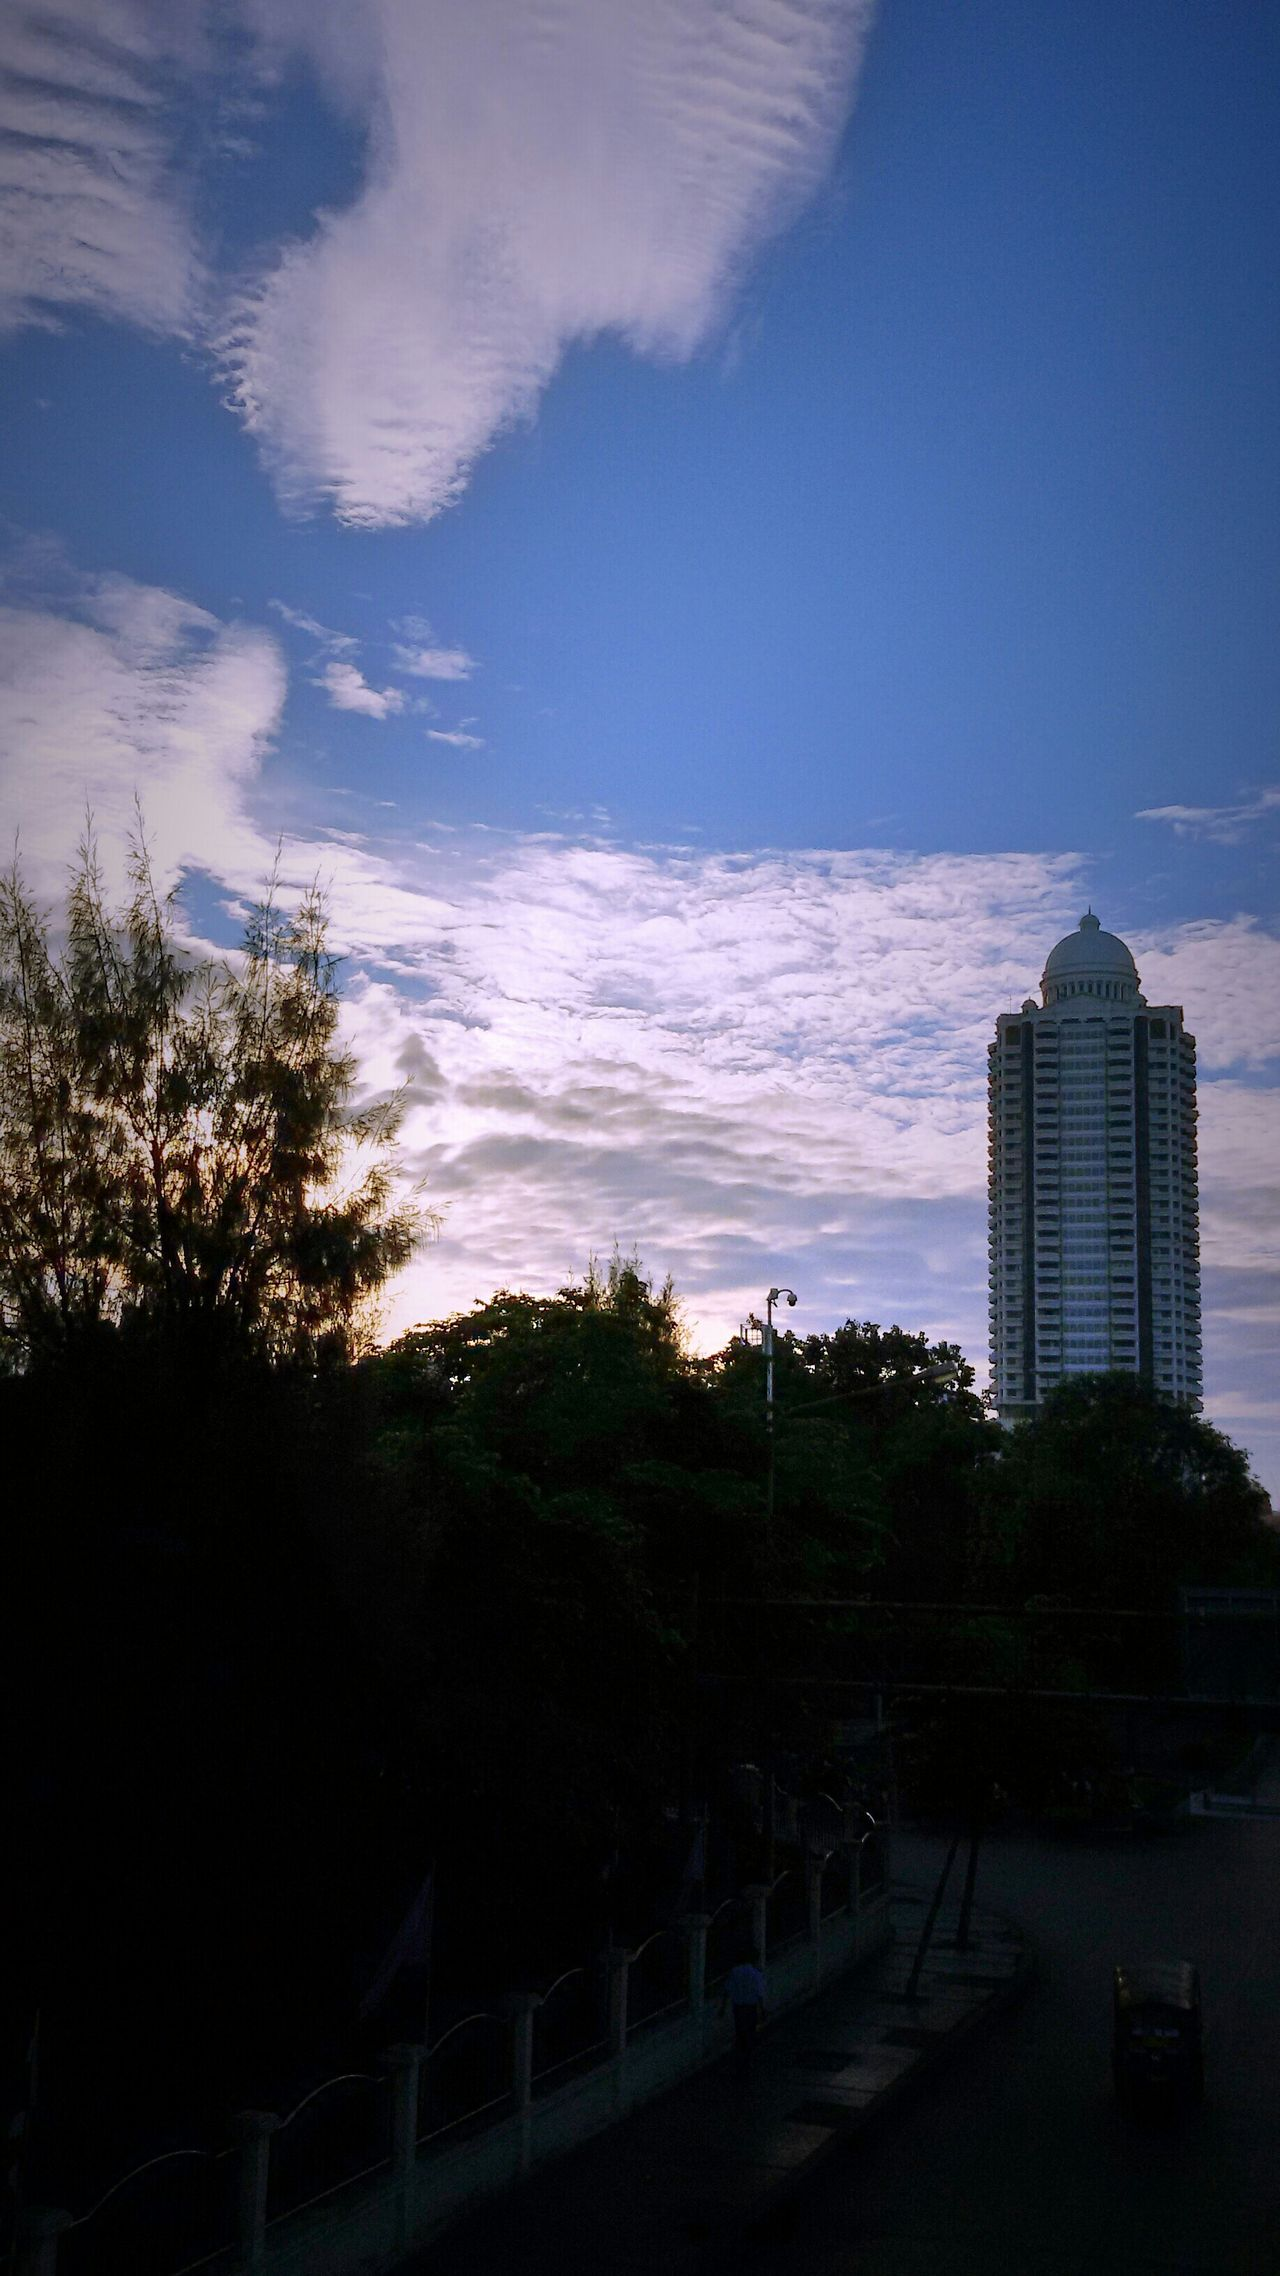 Nice Sky , clound&sky cloundporn Hanging Out Open Edit. Eyeem Gallery Taking Photos.